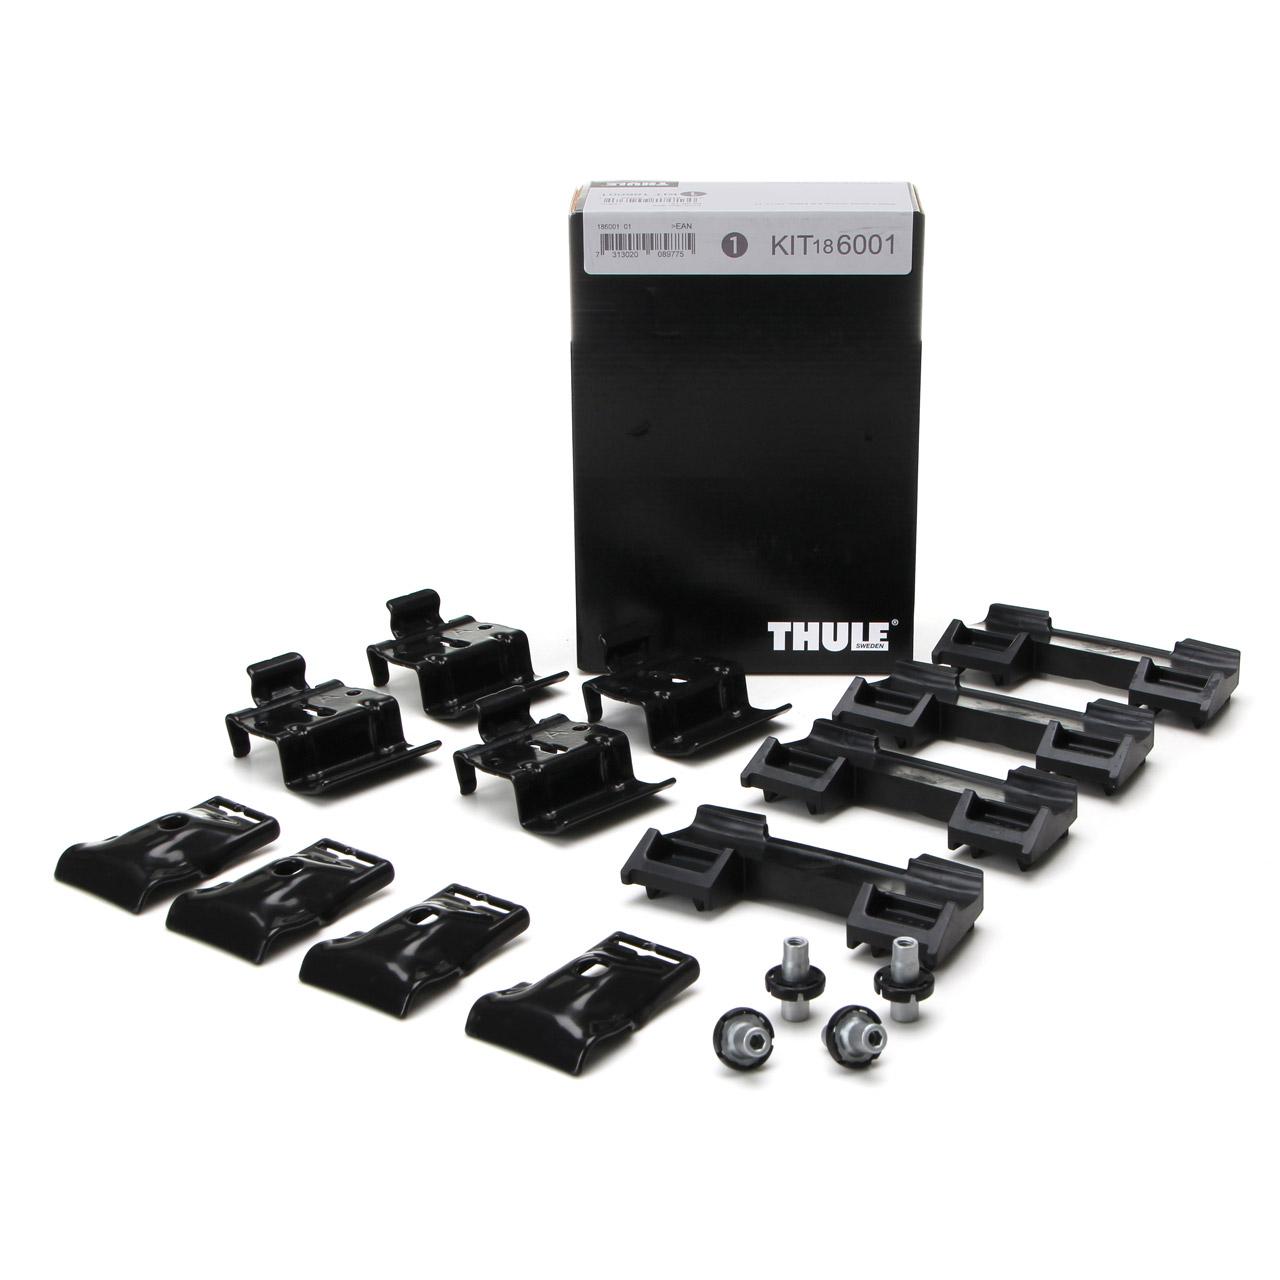 THULE 6001 Montagesatz Montagekit Dachträger Evo Flush BMW 5er F11 G31 Touring